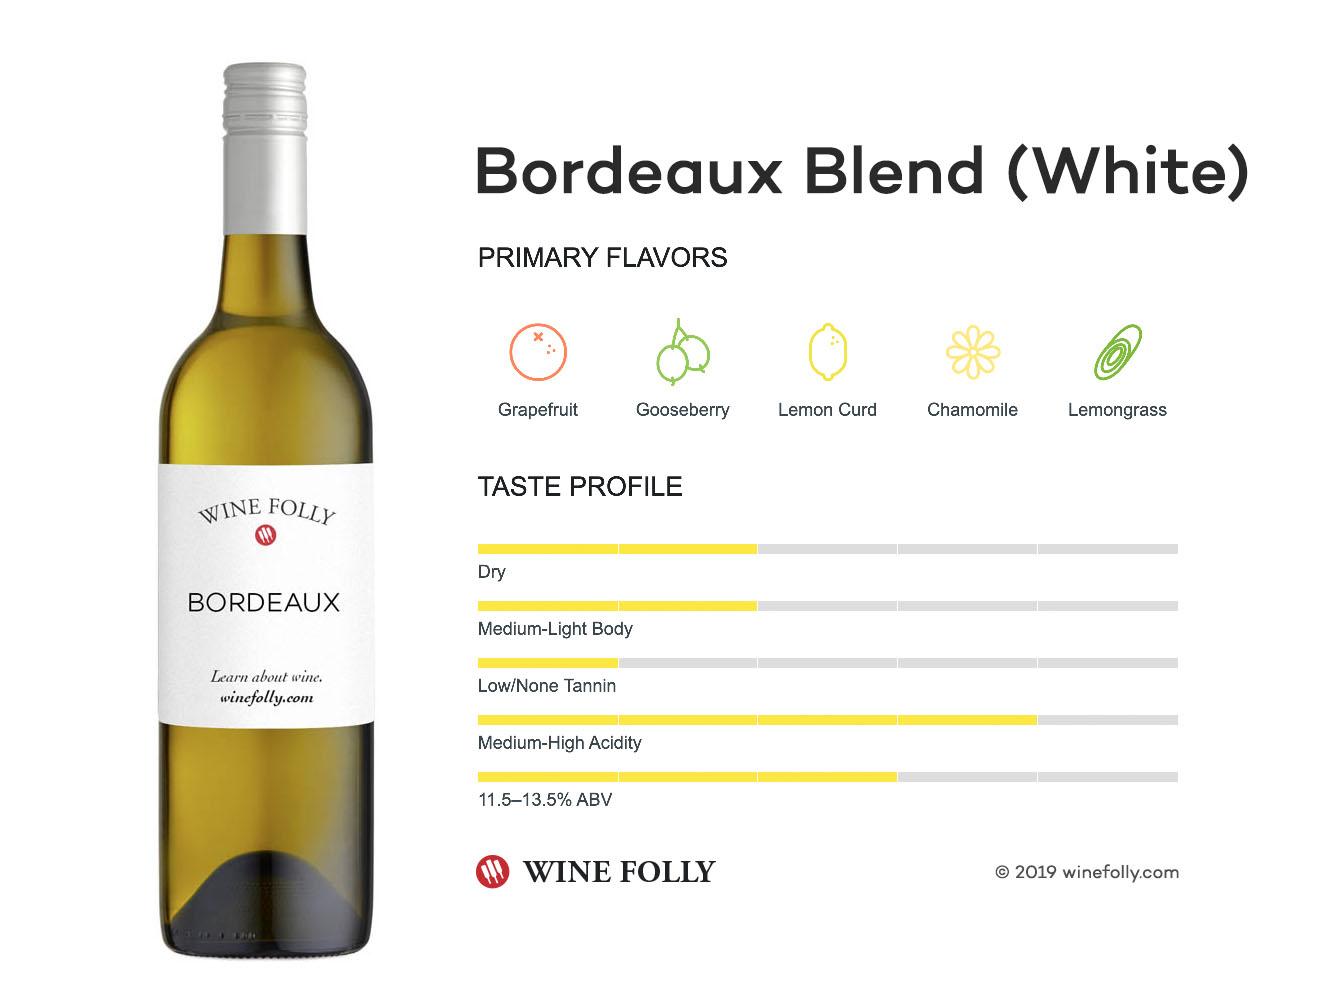 White Bordeaux / Bordeaux Blanc wine blend taste profile - Wine Folly